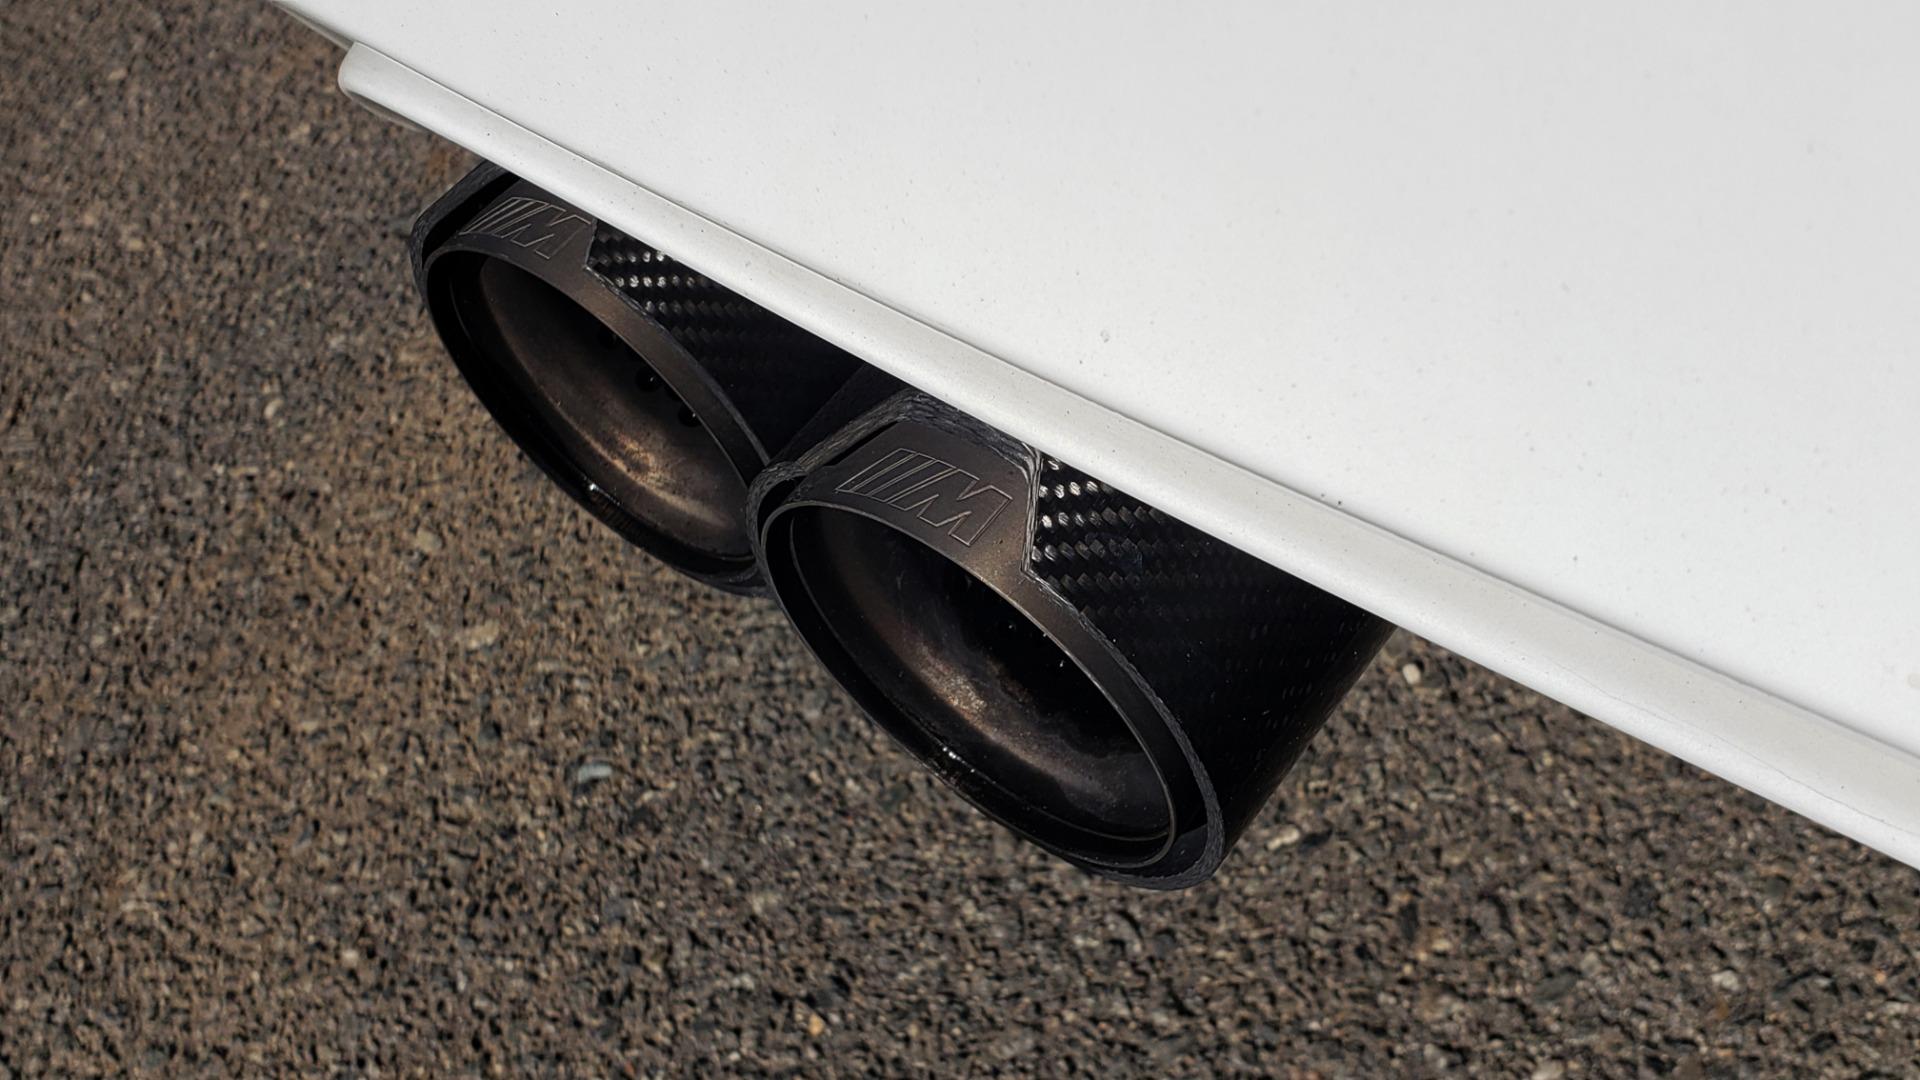 Used 2018 BMW M4 COMP PKG / EXEC / M-DRIVER / PARK CNTRL / ACTIVE BLIND SPOT for sale $45,449 at Formula Imports in Charlotte NC 28227 26